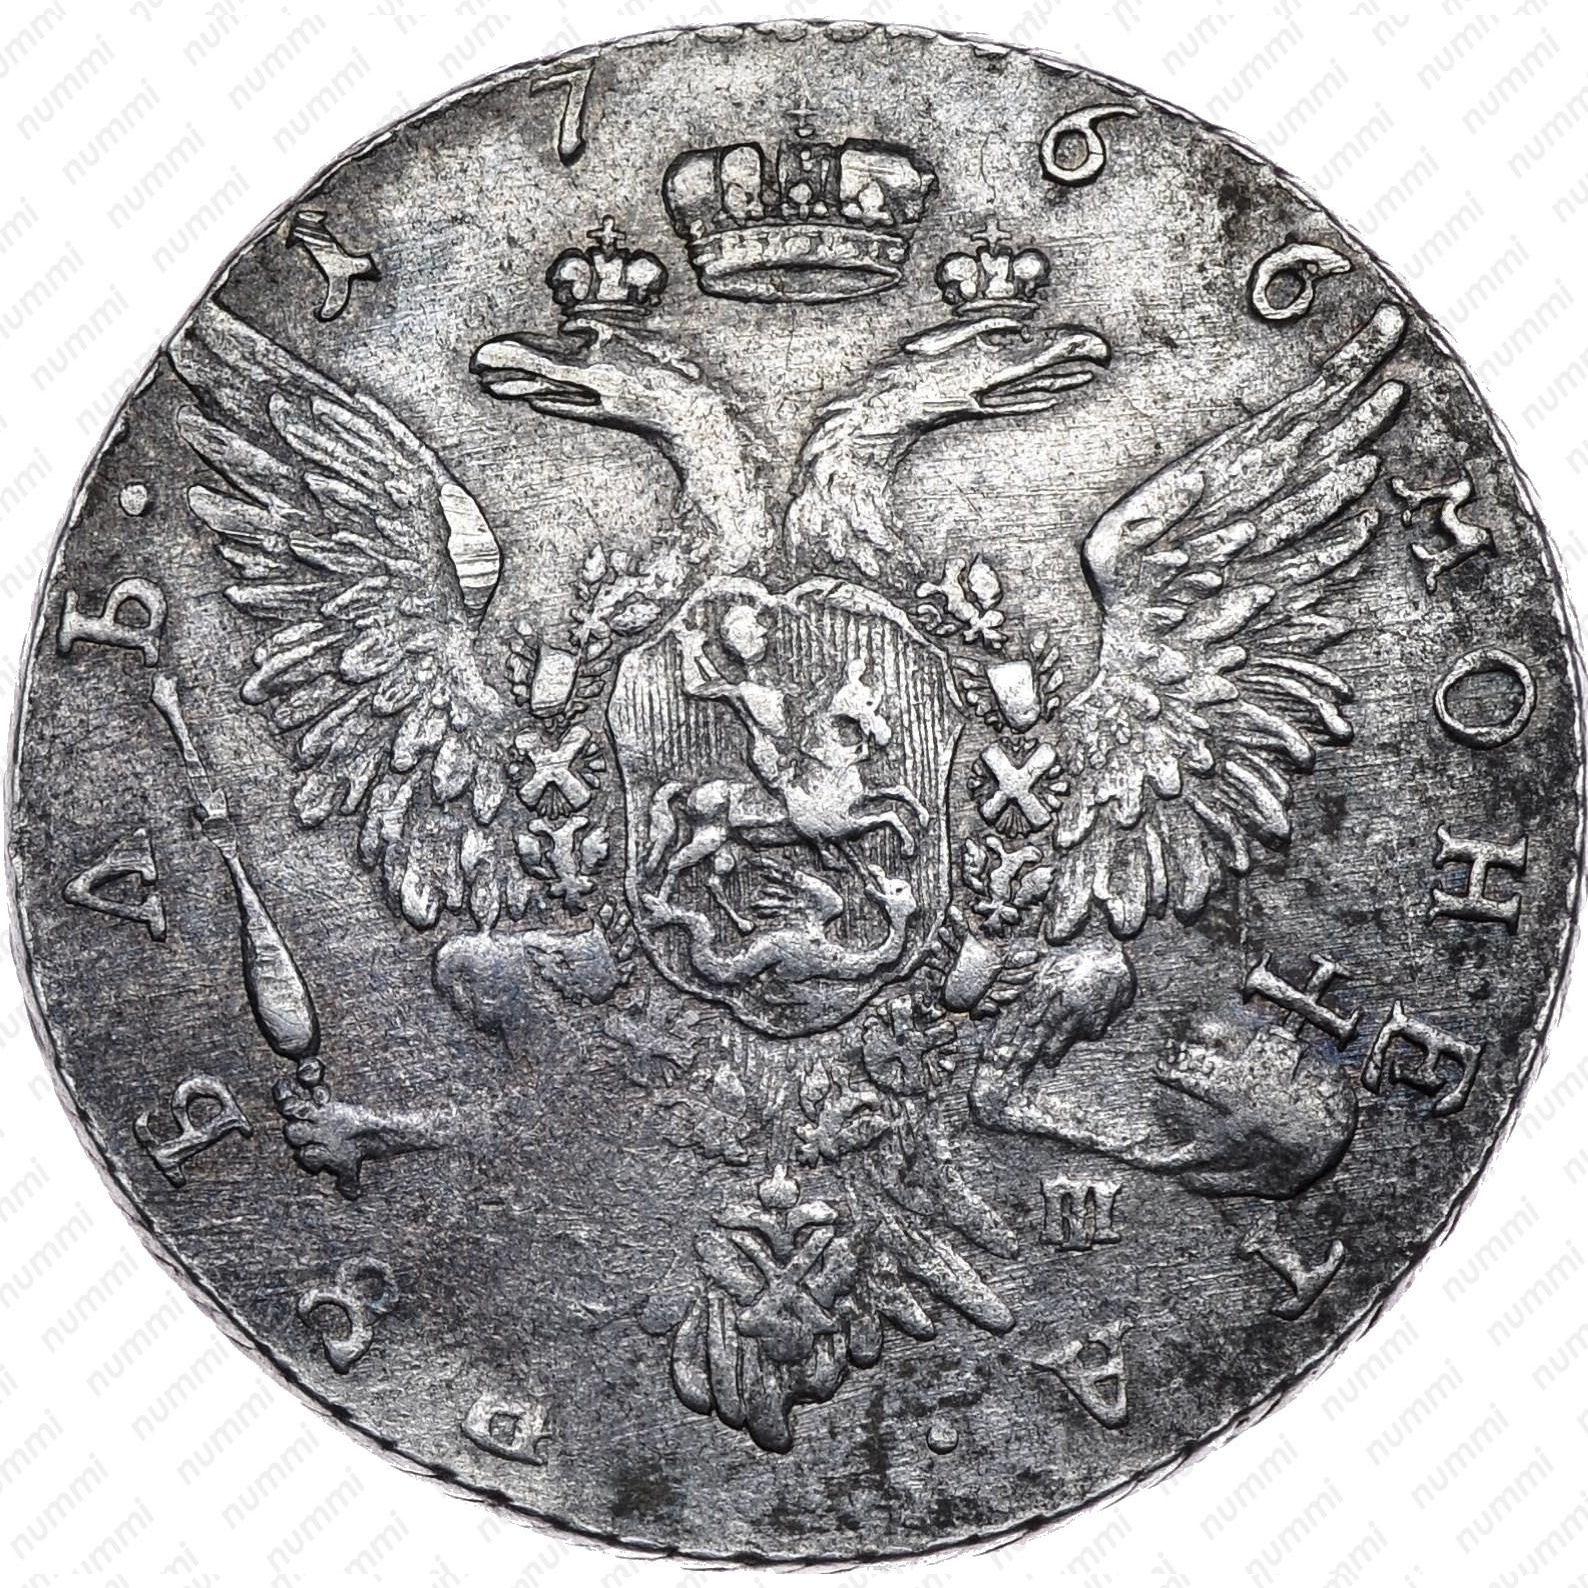 1 рубль 1766, СПБ-TI-АШ, портрет грубого чекана - Реверс ...